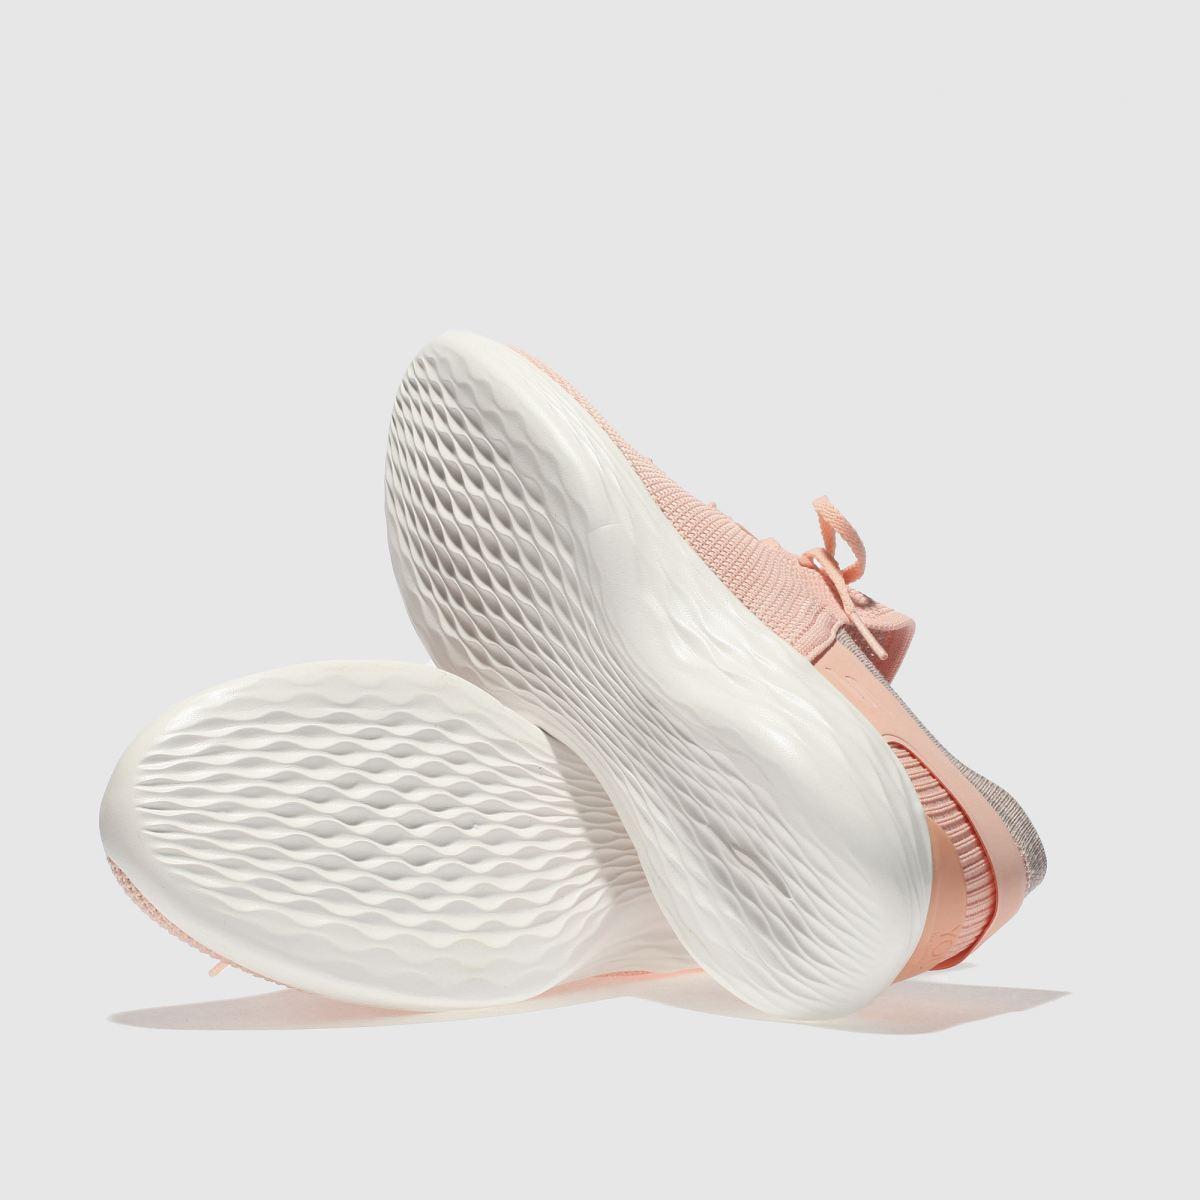 Damen Pfirsich Gute skechers You Spirit Sneaker | schuh Gute Pfirsich Qualität beliebte Schuhe 96a66b